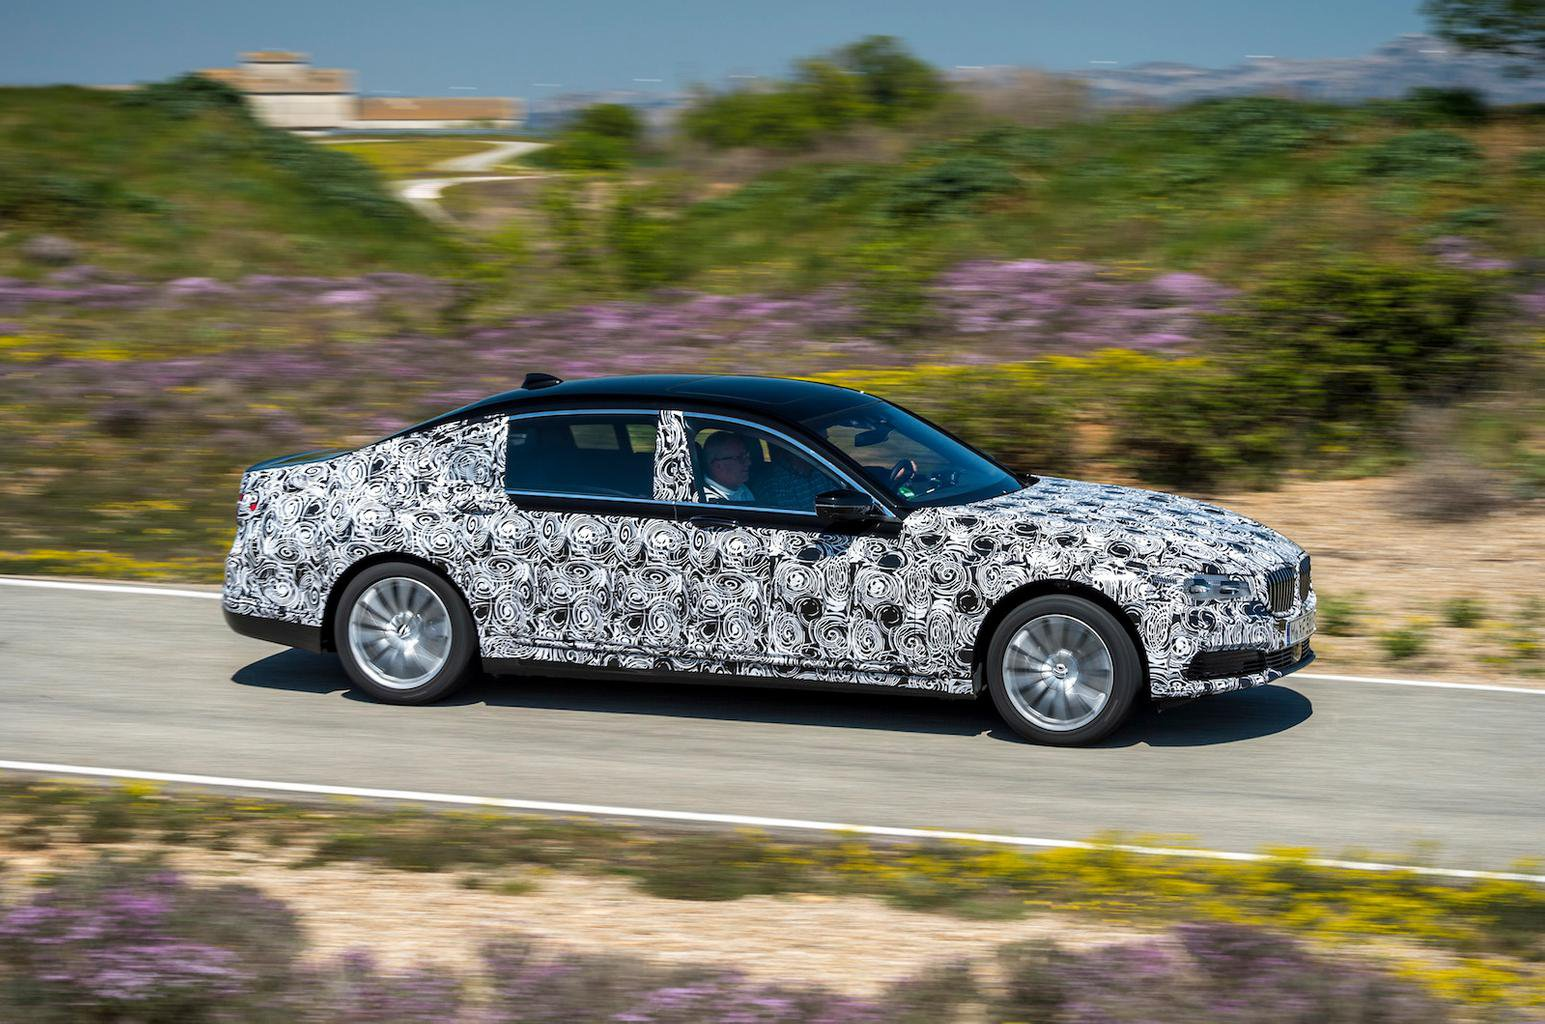 2015 BMW 7 Series prototype review